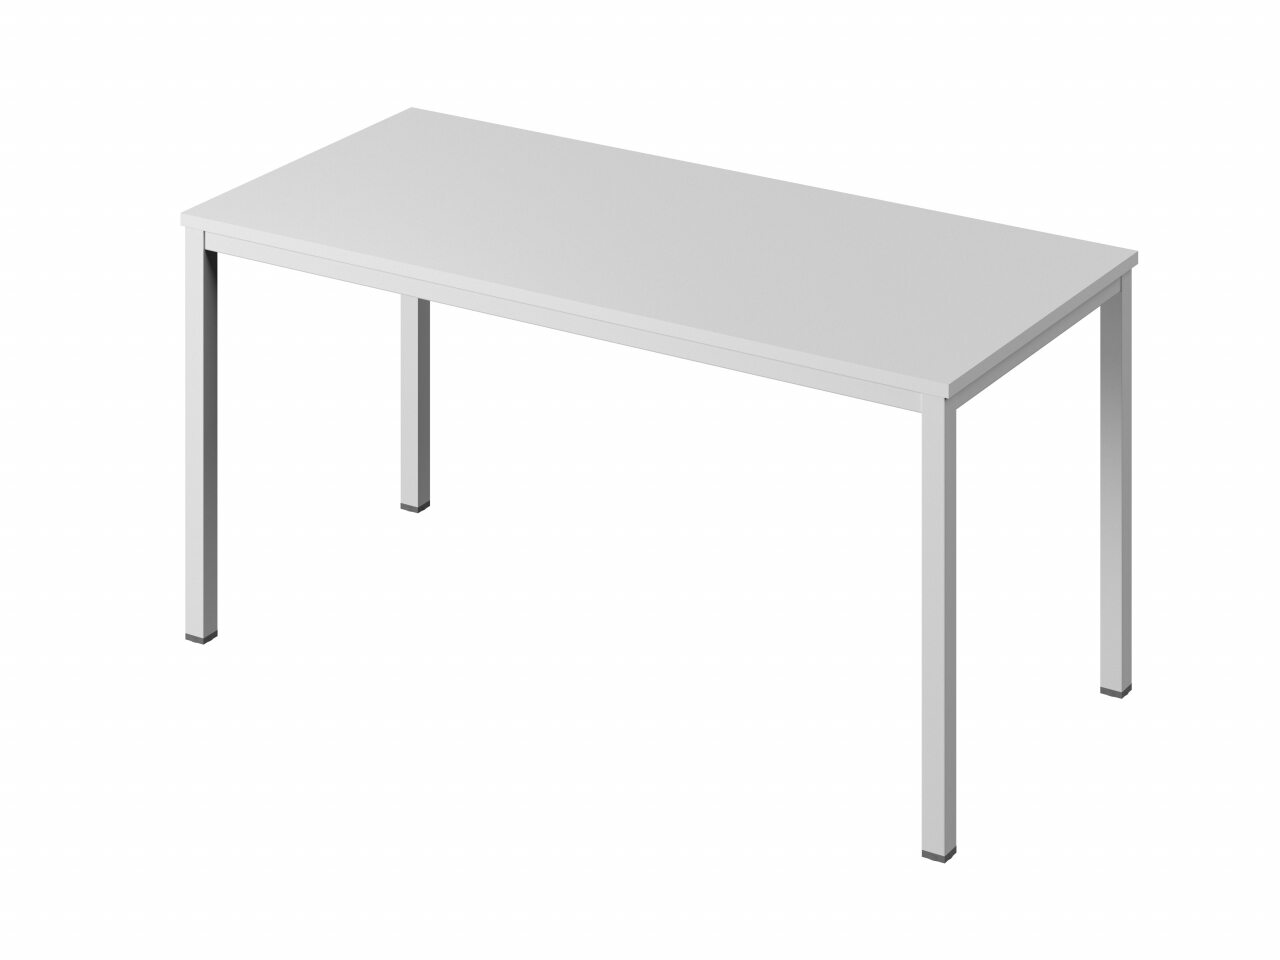 Стол на металлокаркасе без заглушек кабель-канала - фото 2